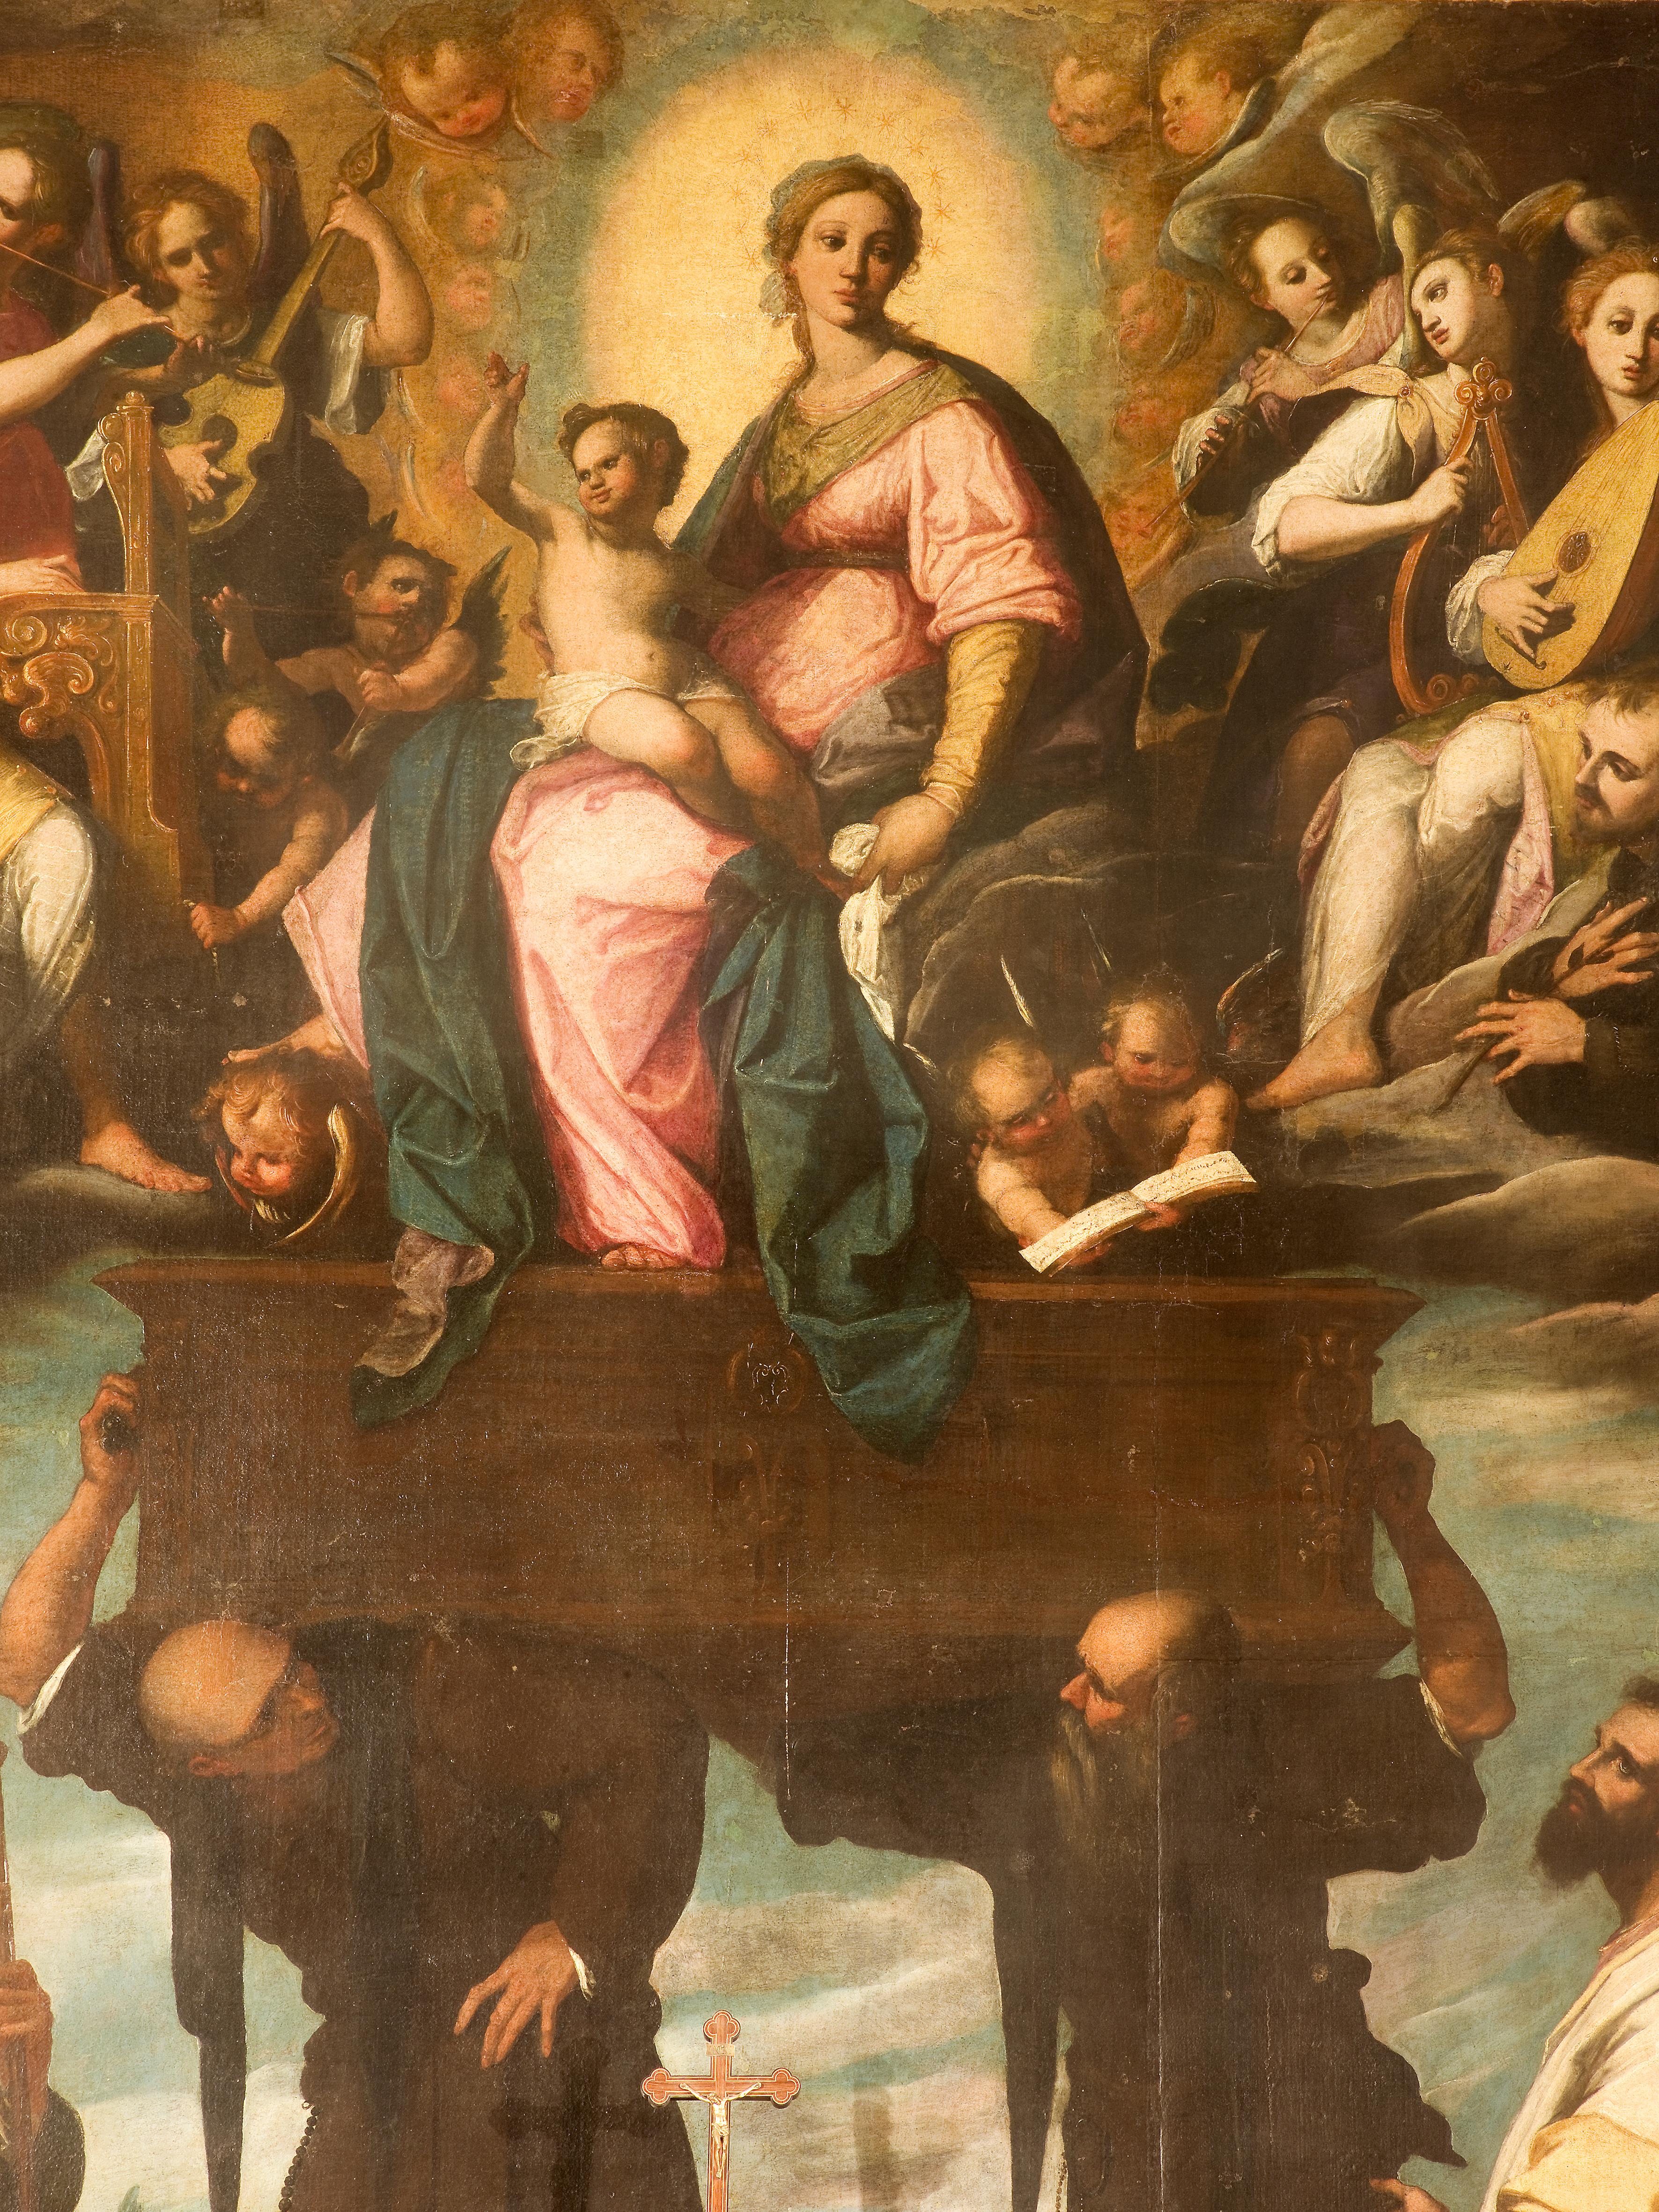 Filippo Paladini, B. V. Maria Odigitria, olio su tela, 1604